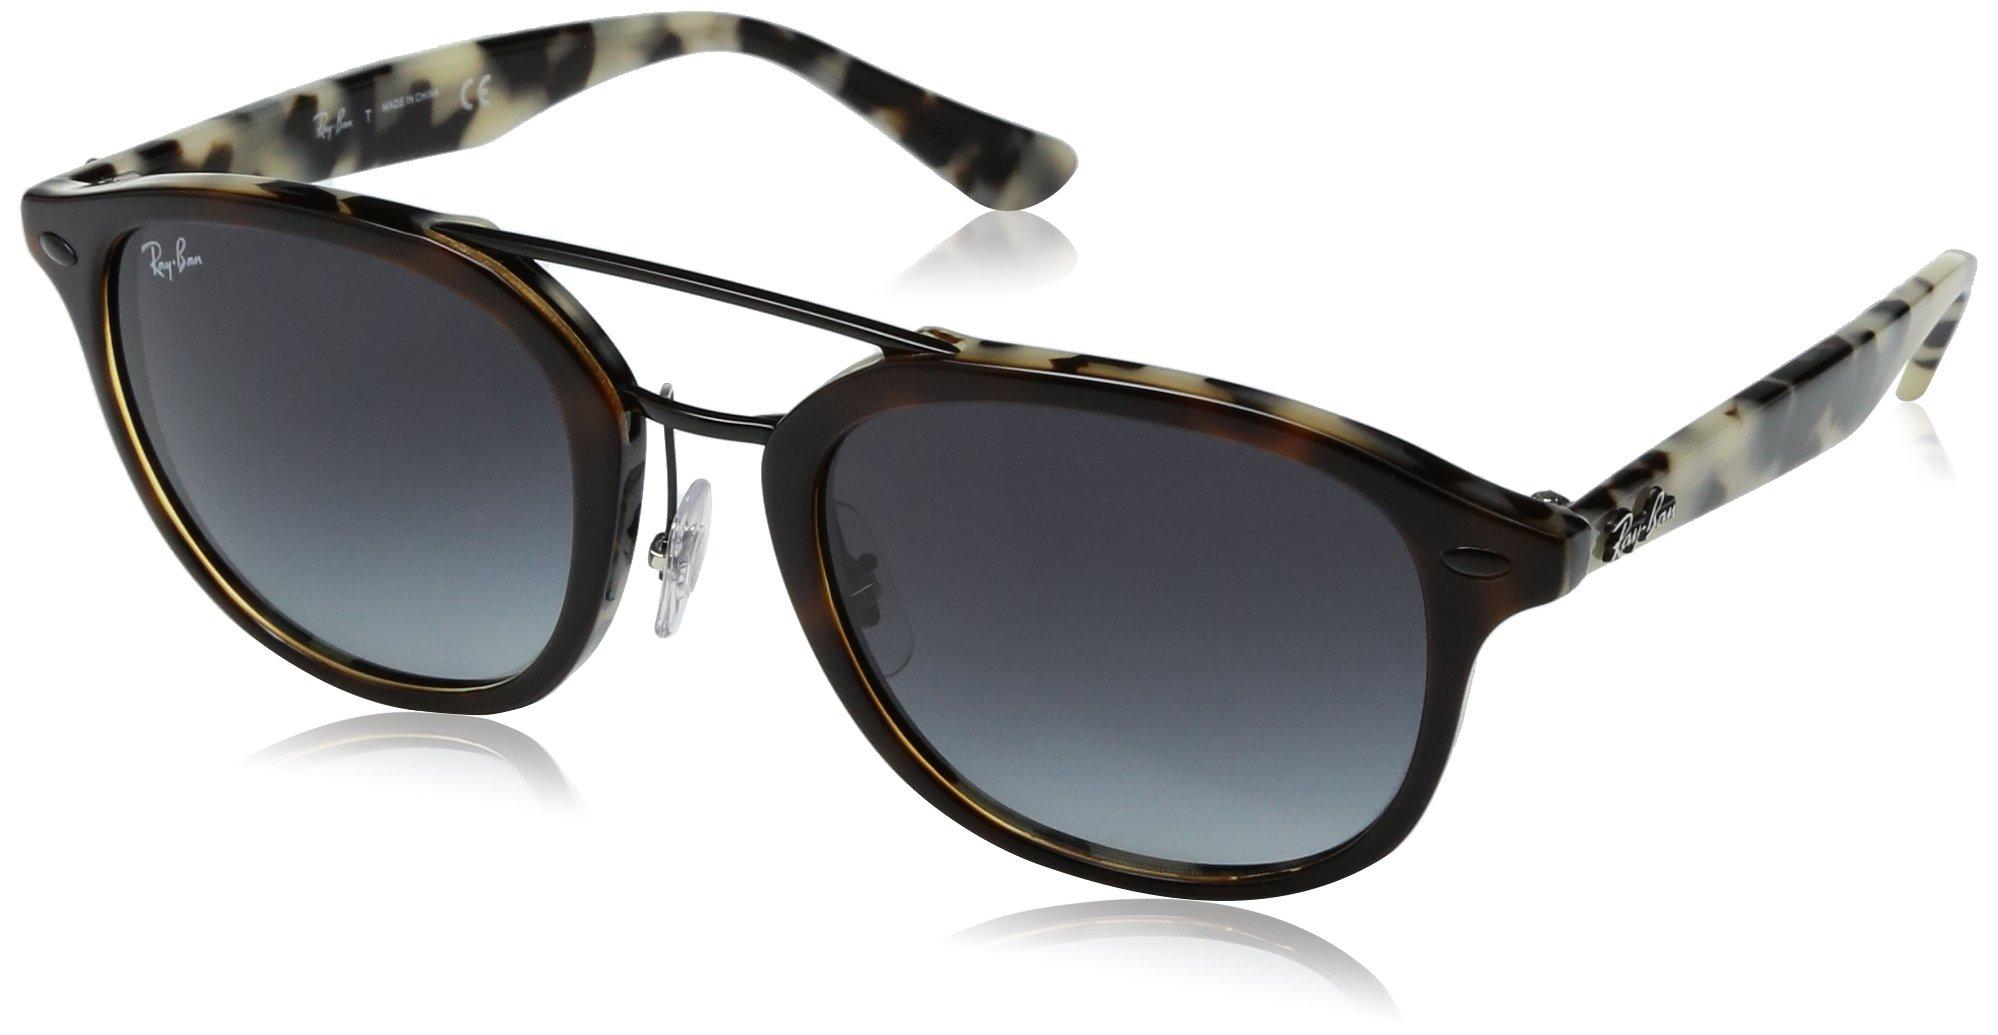 Ray-Ban RB2183 Square Sunglasses, Tortoise & Tortoise Beige/Grey Gradient, 53 mm